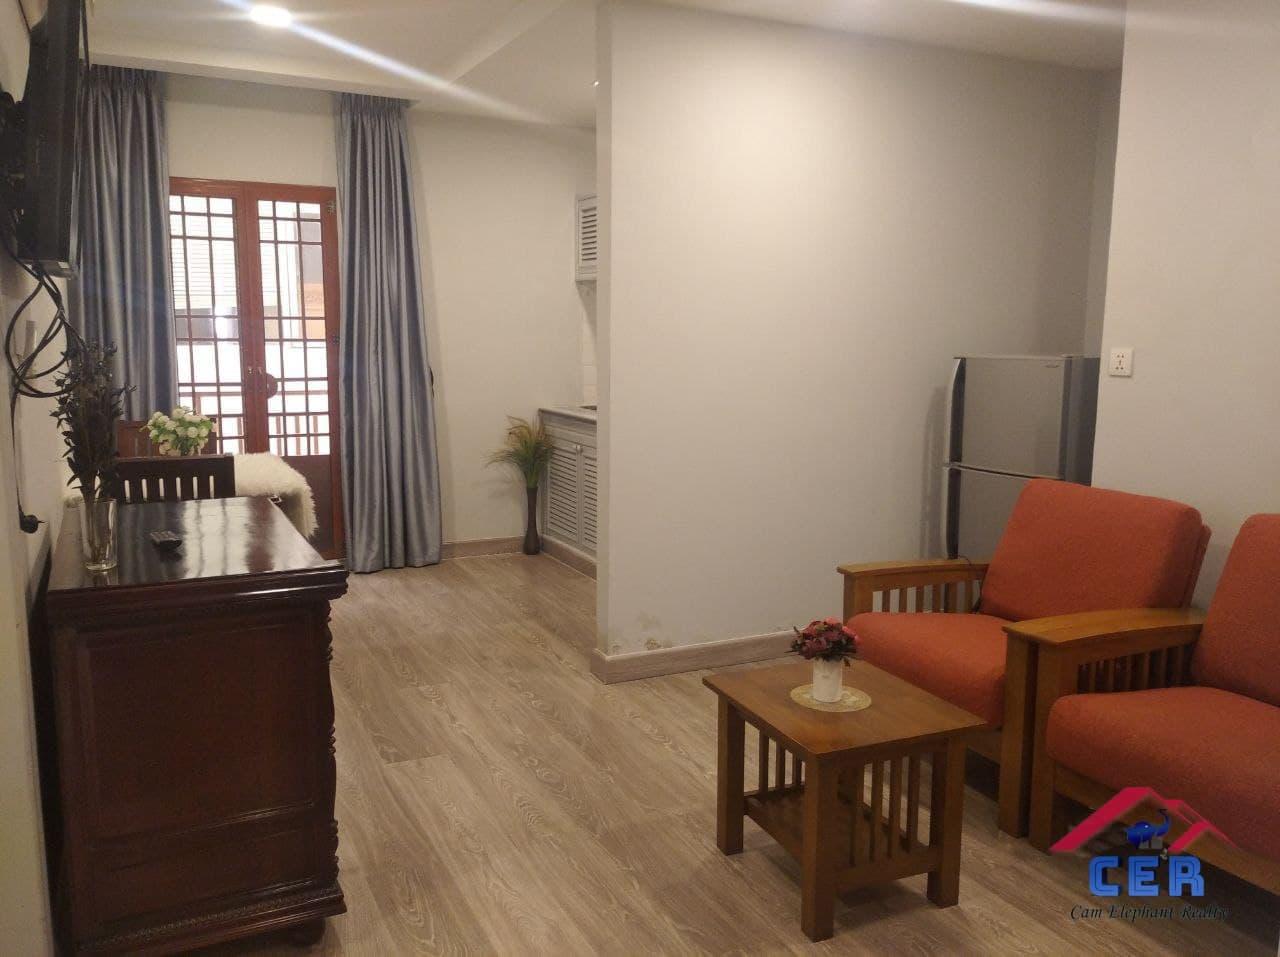 Nice Apartment for Rent (1Bedroom; BKK1 area)